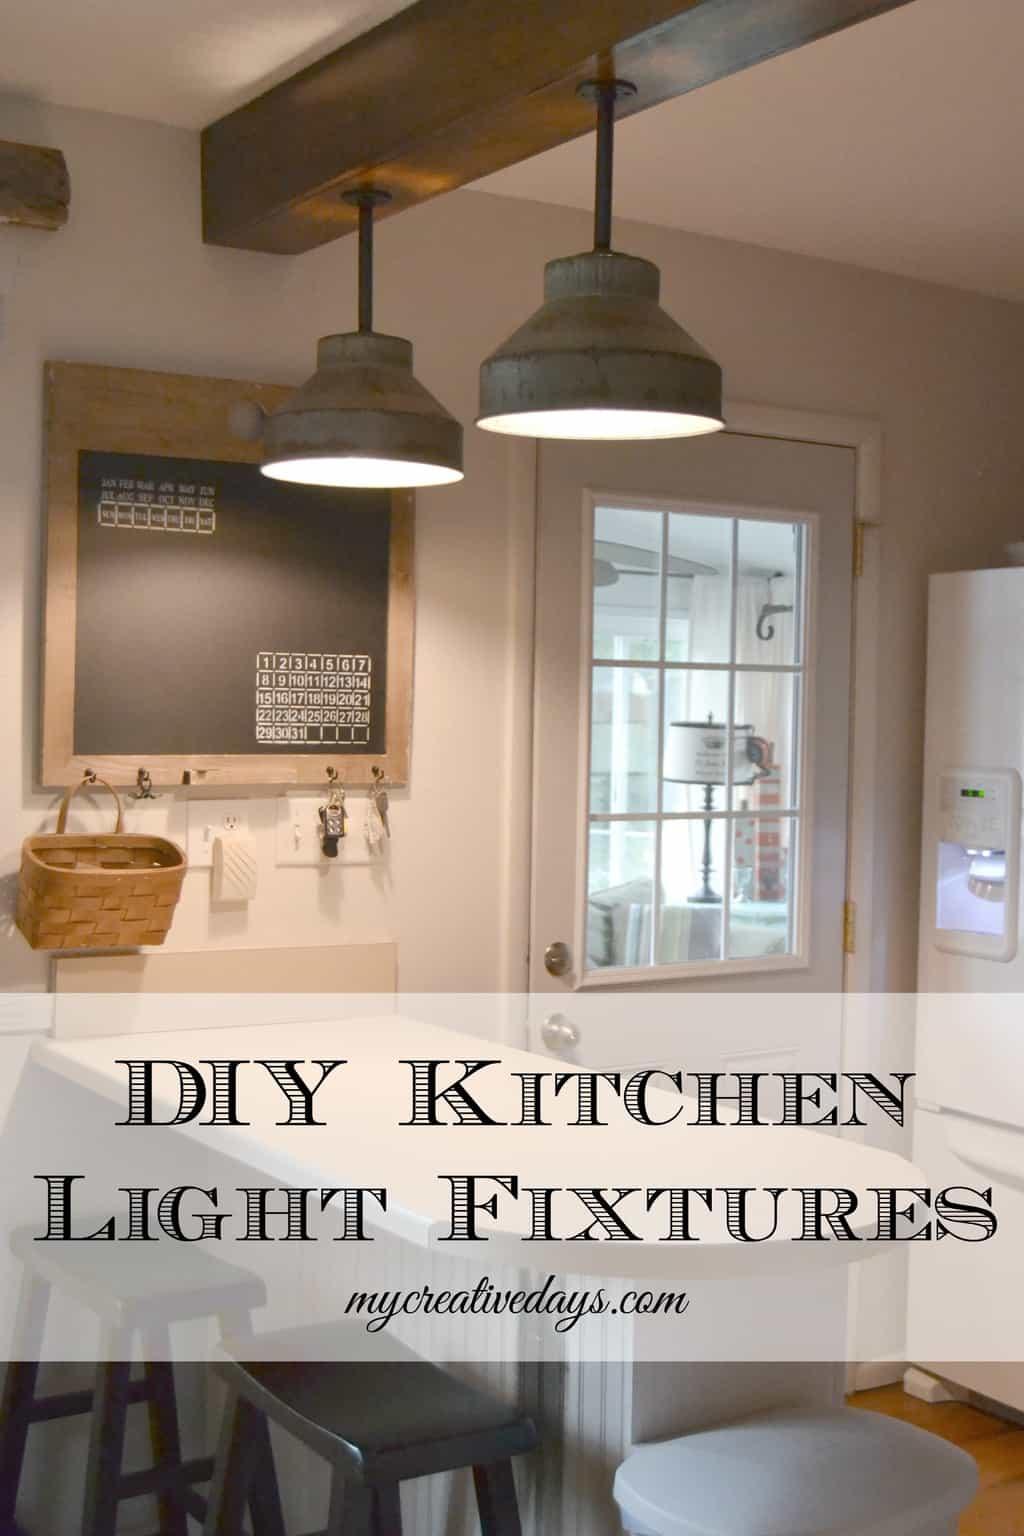 DIY Kitchen Light Fixtures Part 2 - My Creative Days